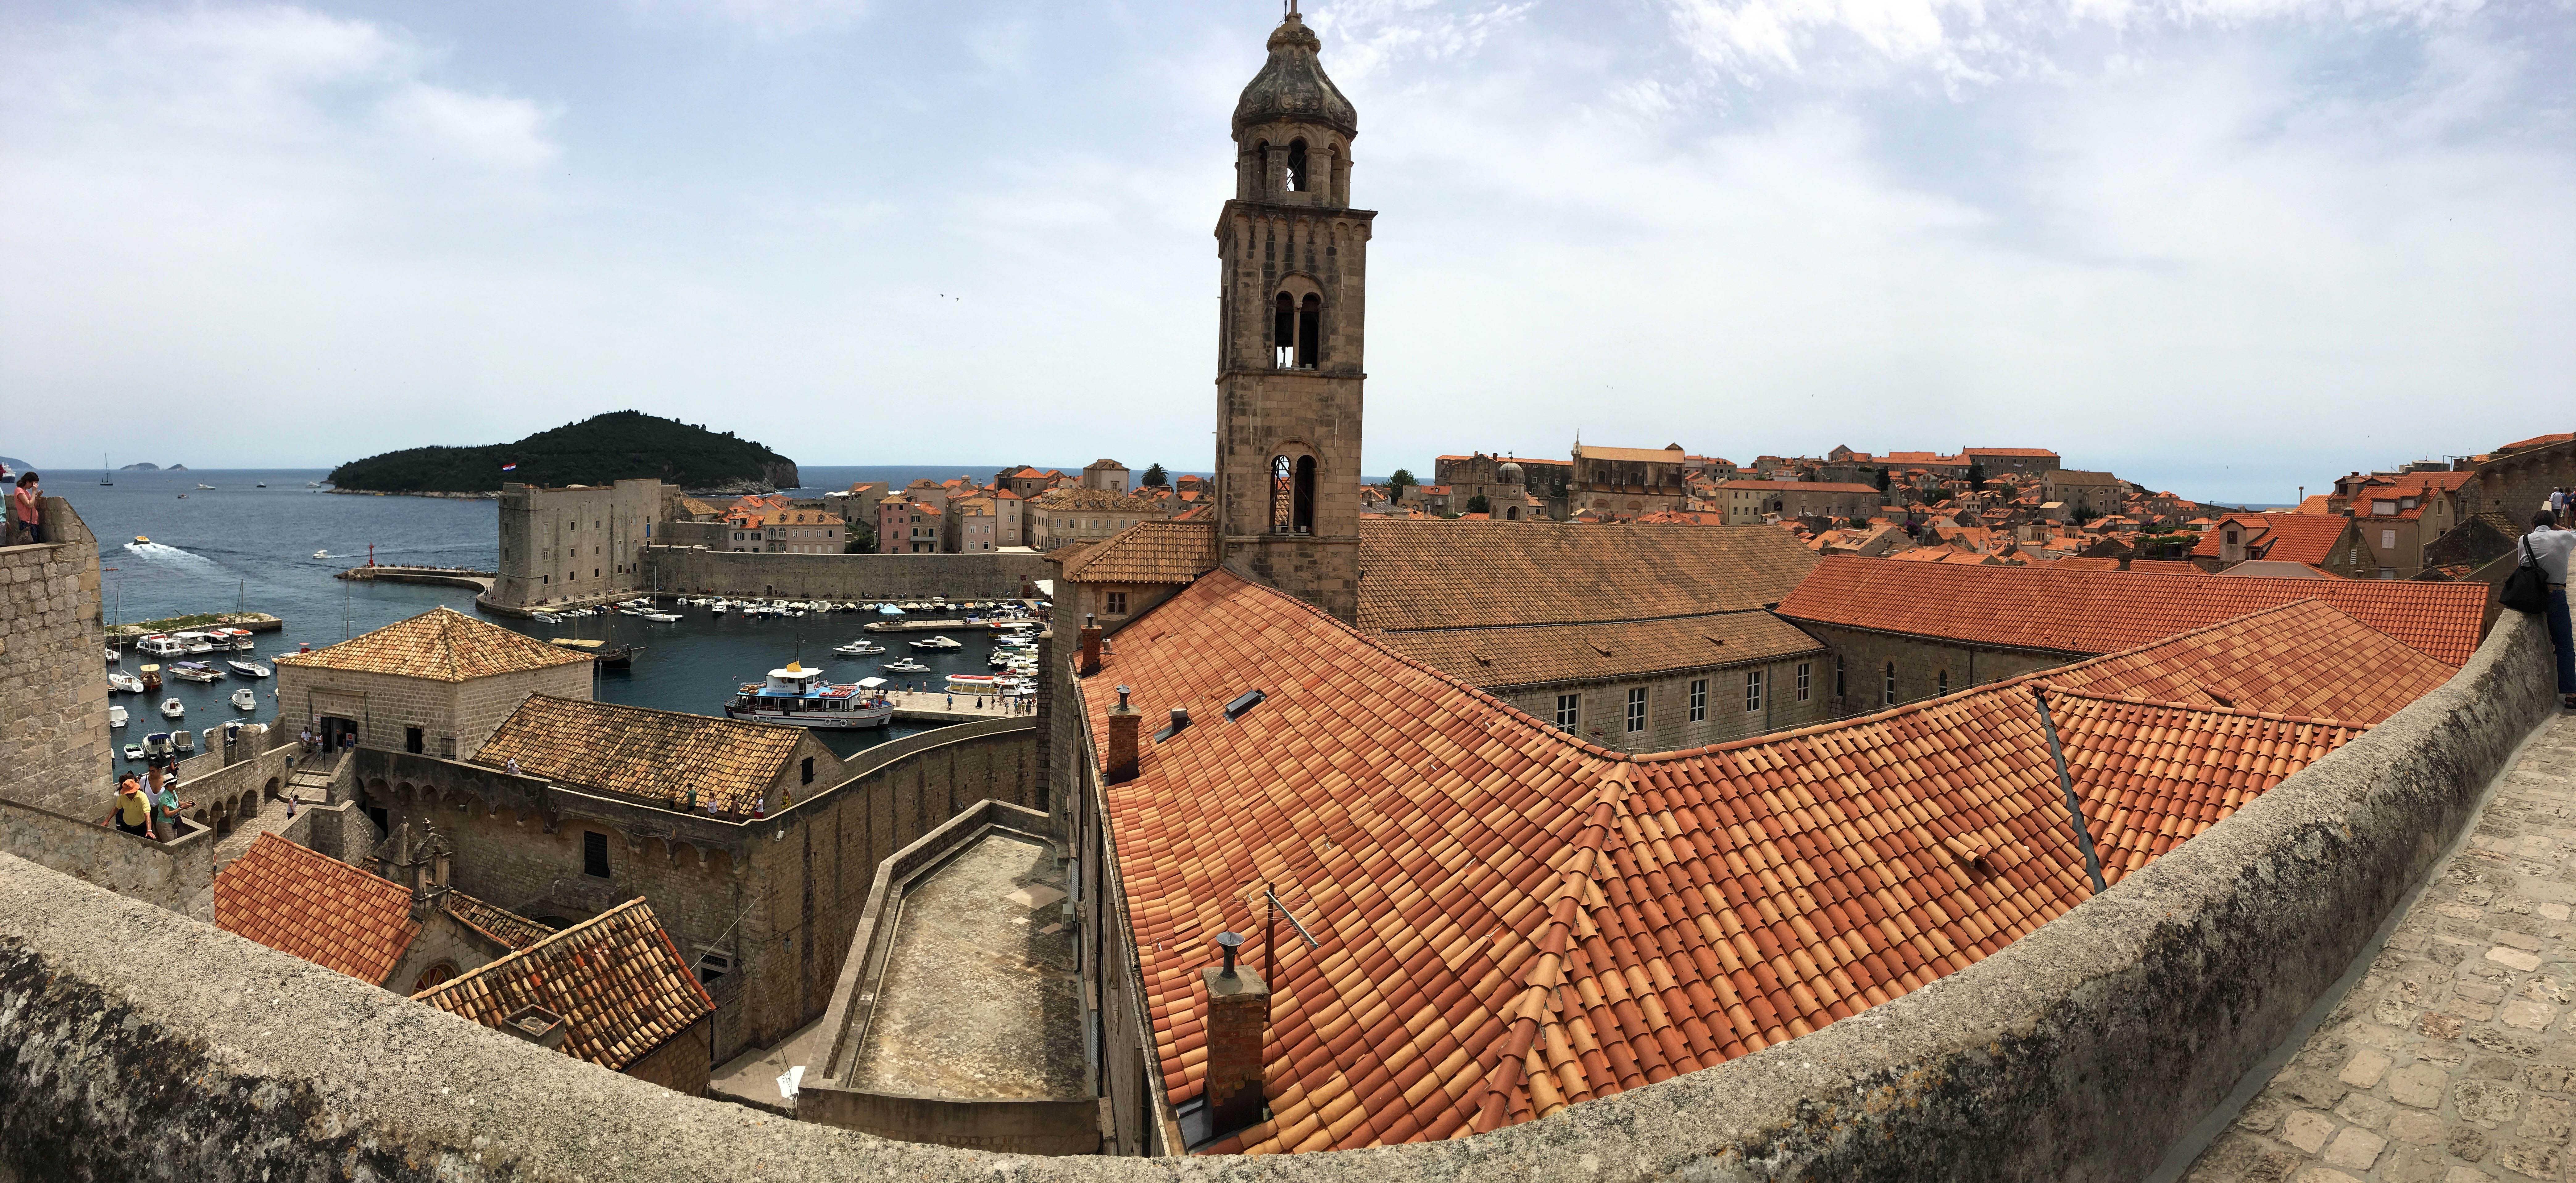 DubrovnikCroatiawallpano1June16